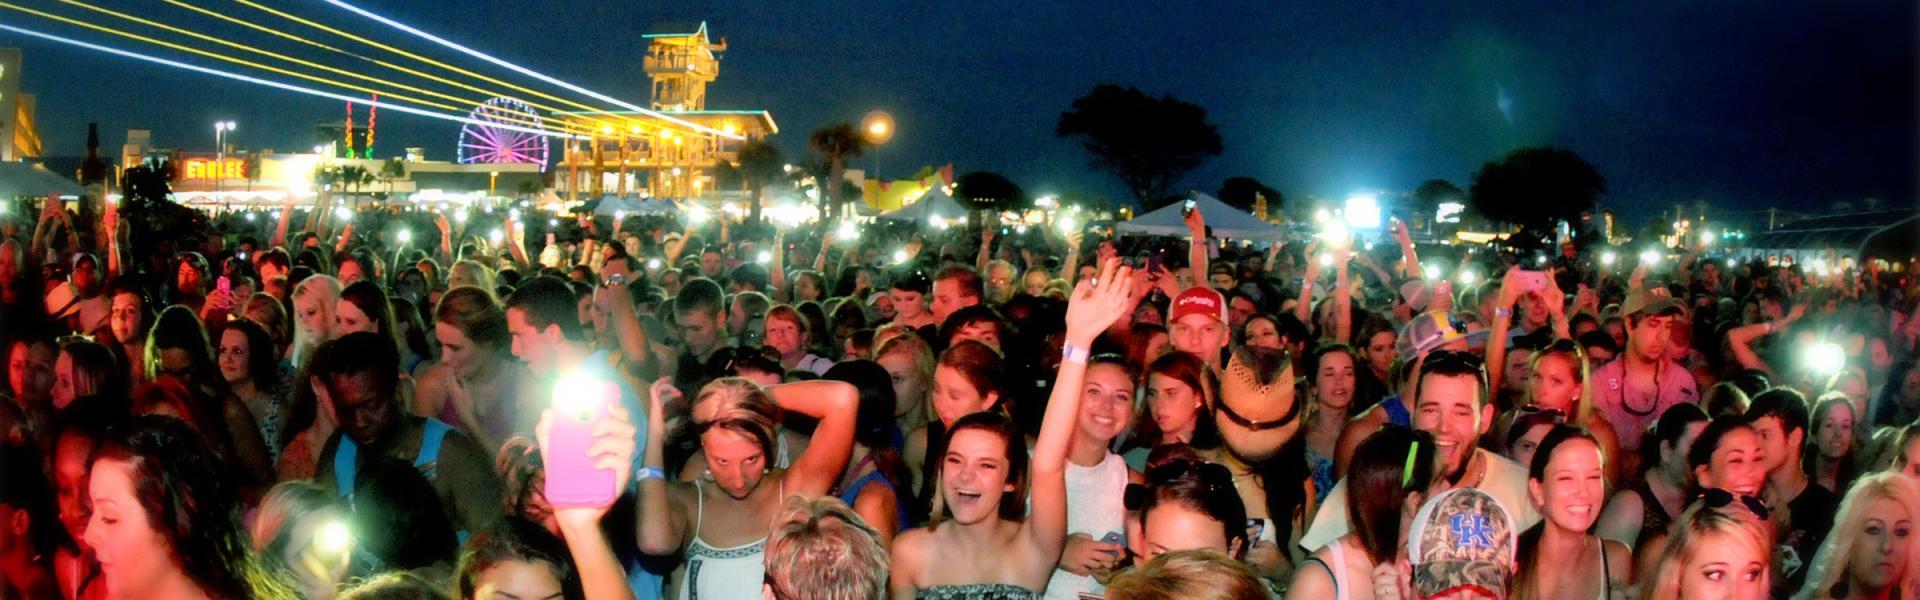 Myrtle Beach Country Music Festival 2020.Carolina Country Music Fest 2020 June 4 7 2020 In Myrtle